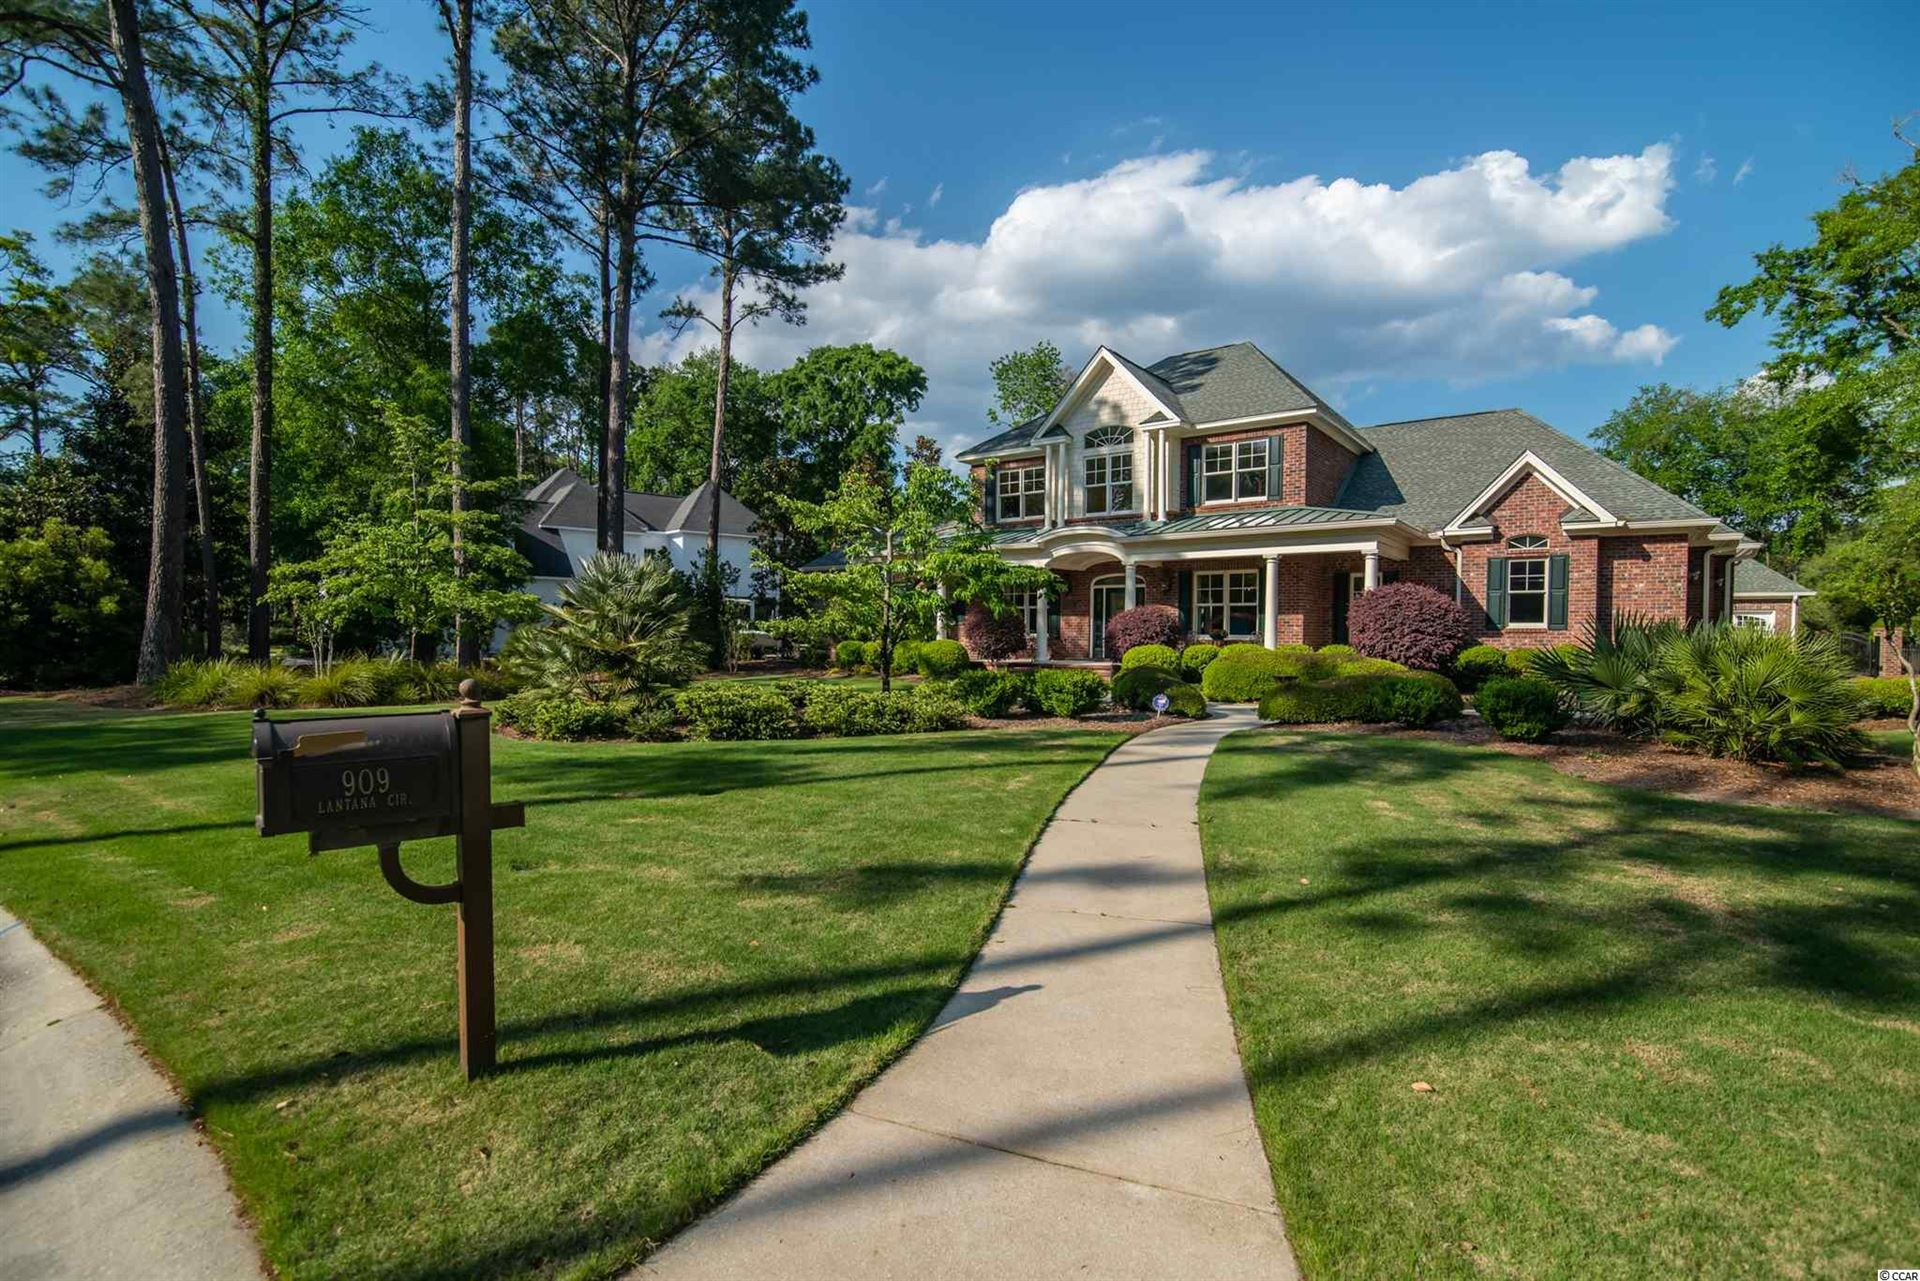 909 Lantana Circle, Georgetown, SC, 29440, Debordieu Colony Home For Sale